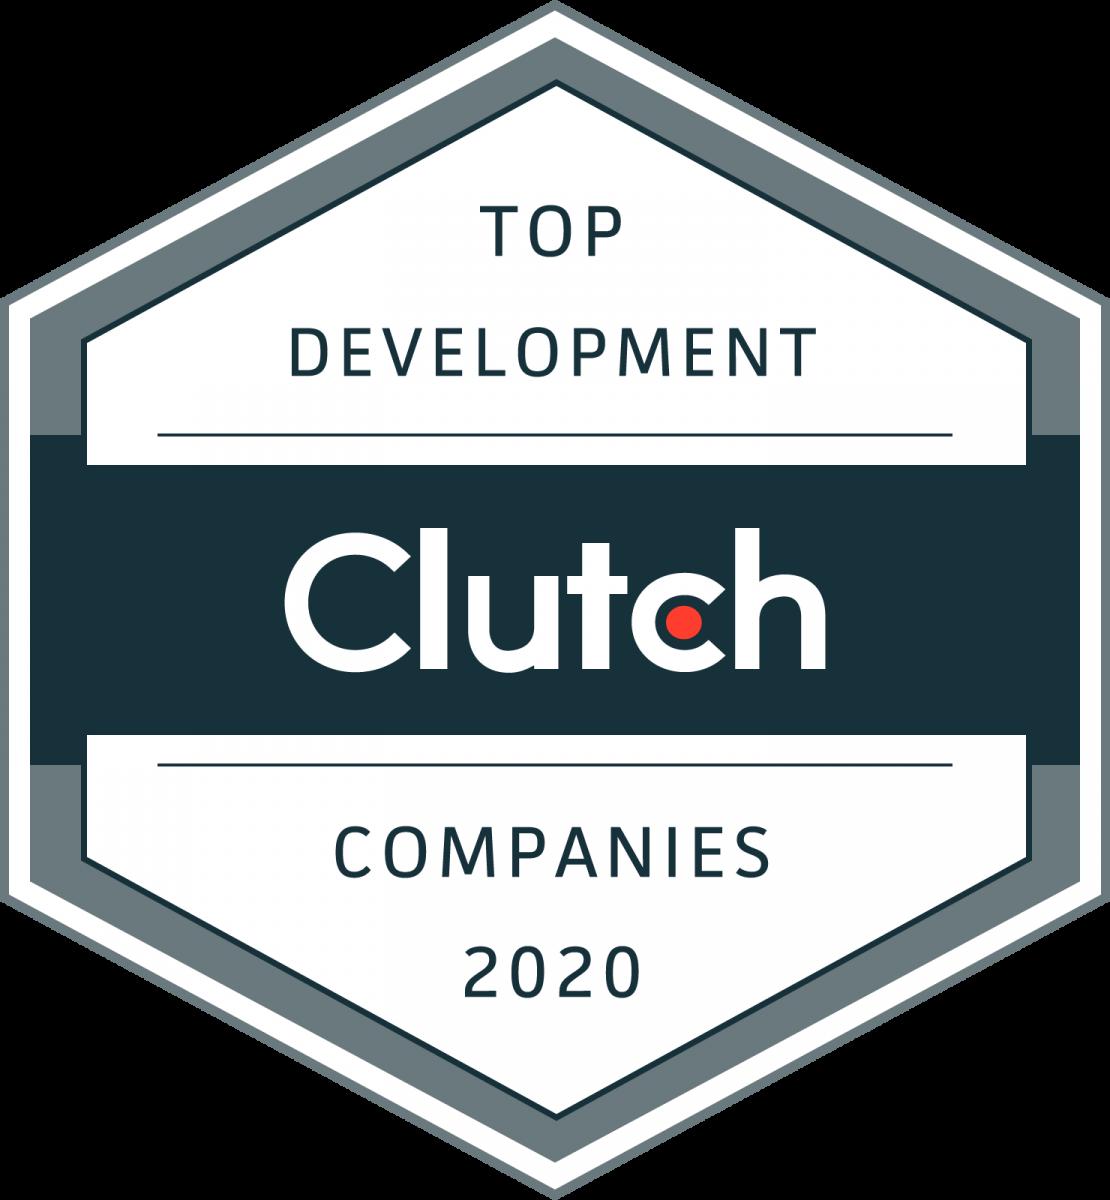 Top Development Companies